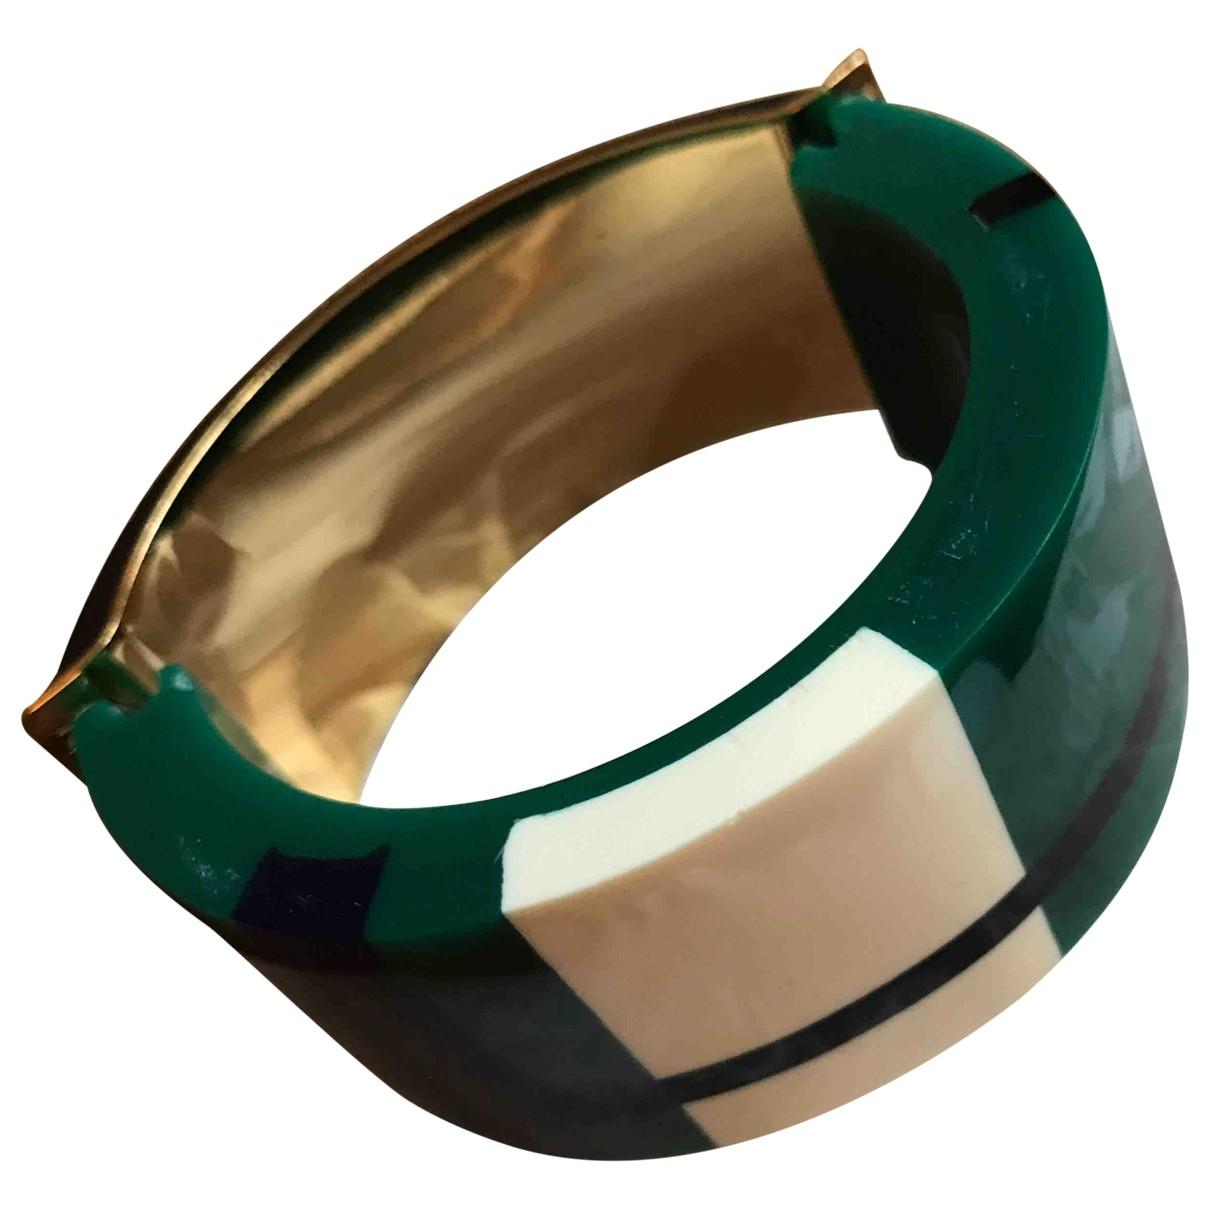 Marni \N Armband in  Gruen Kunststoff